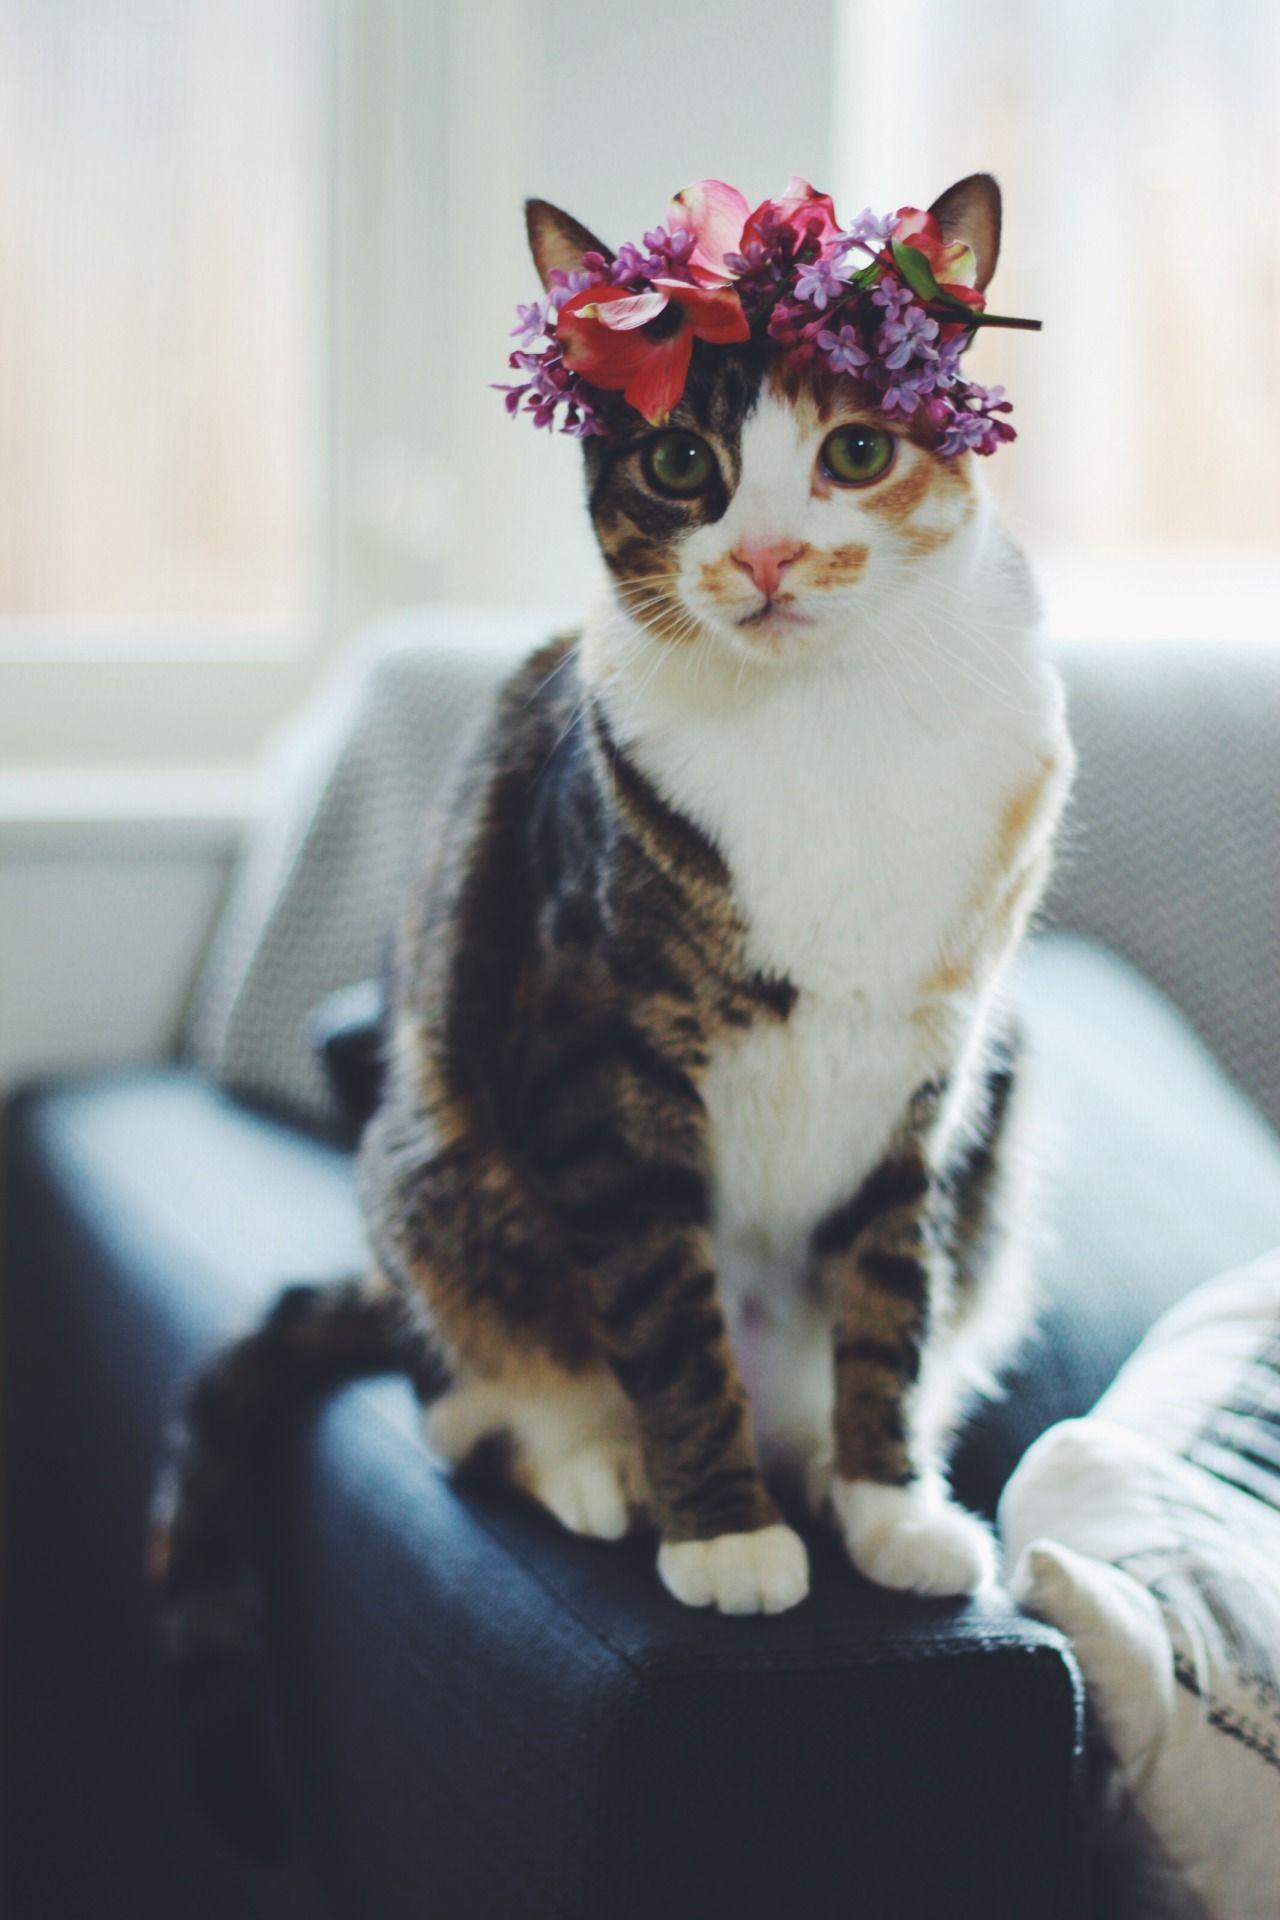 Dearly Beloved 美しい猫 ペット用品 にゃんこ